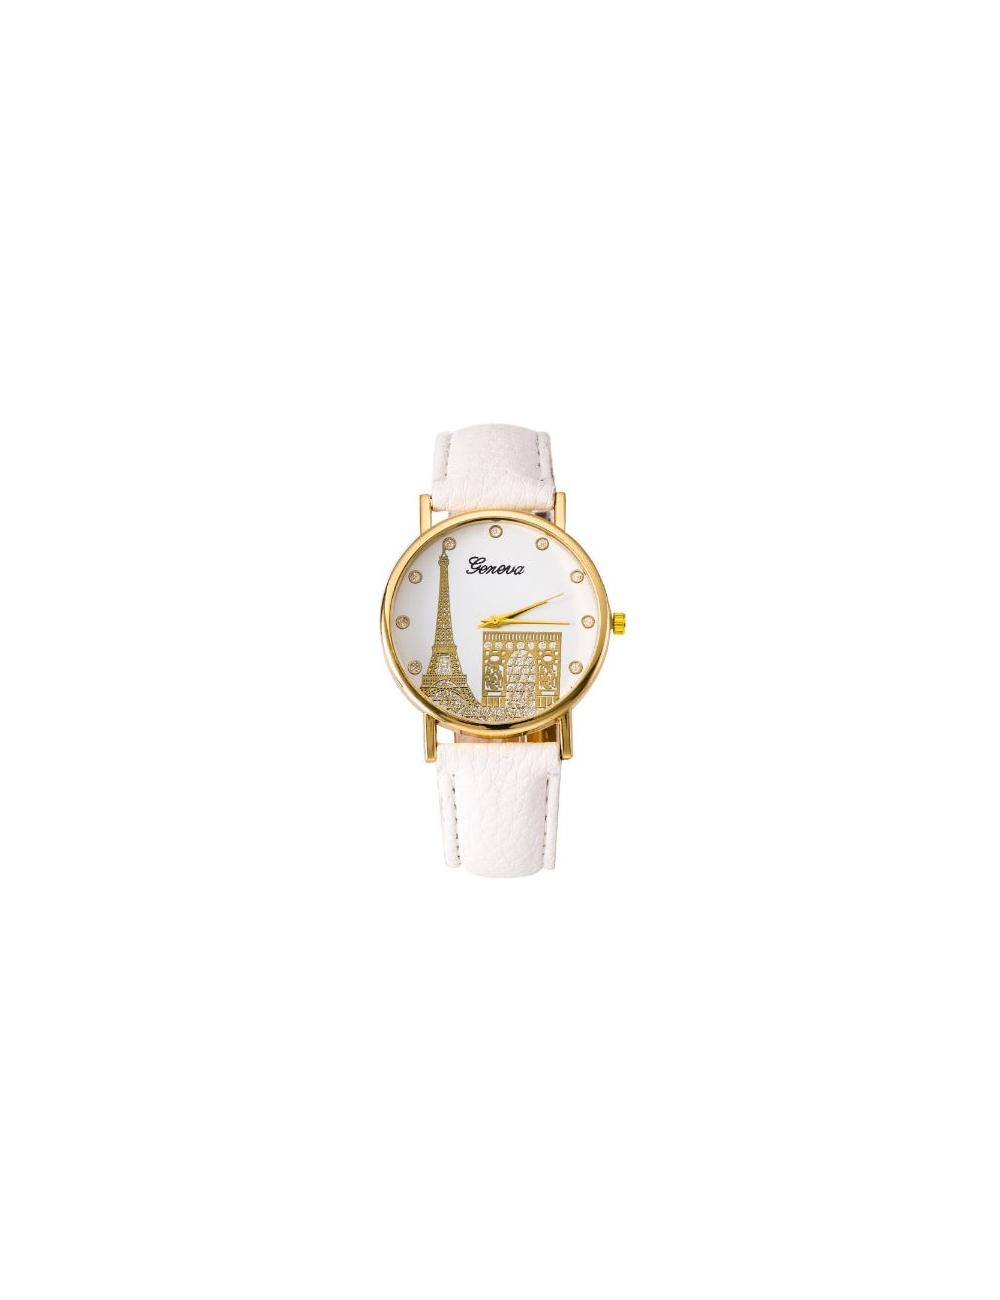 Reloj Eiffel Dayoshop 31,900.00